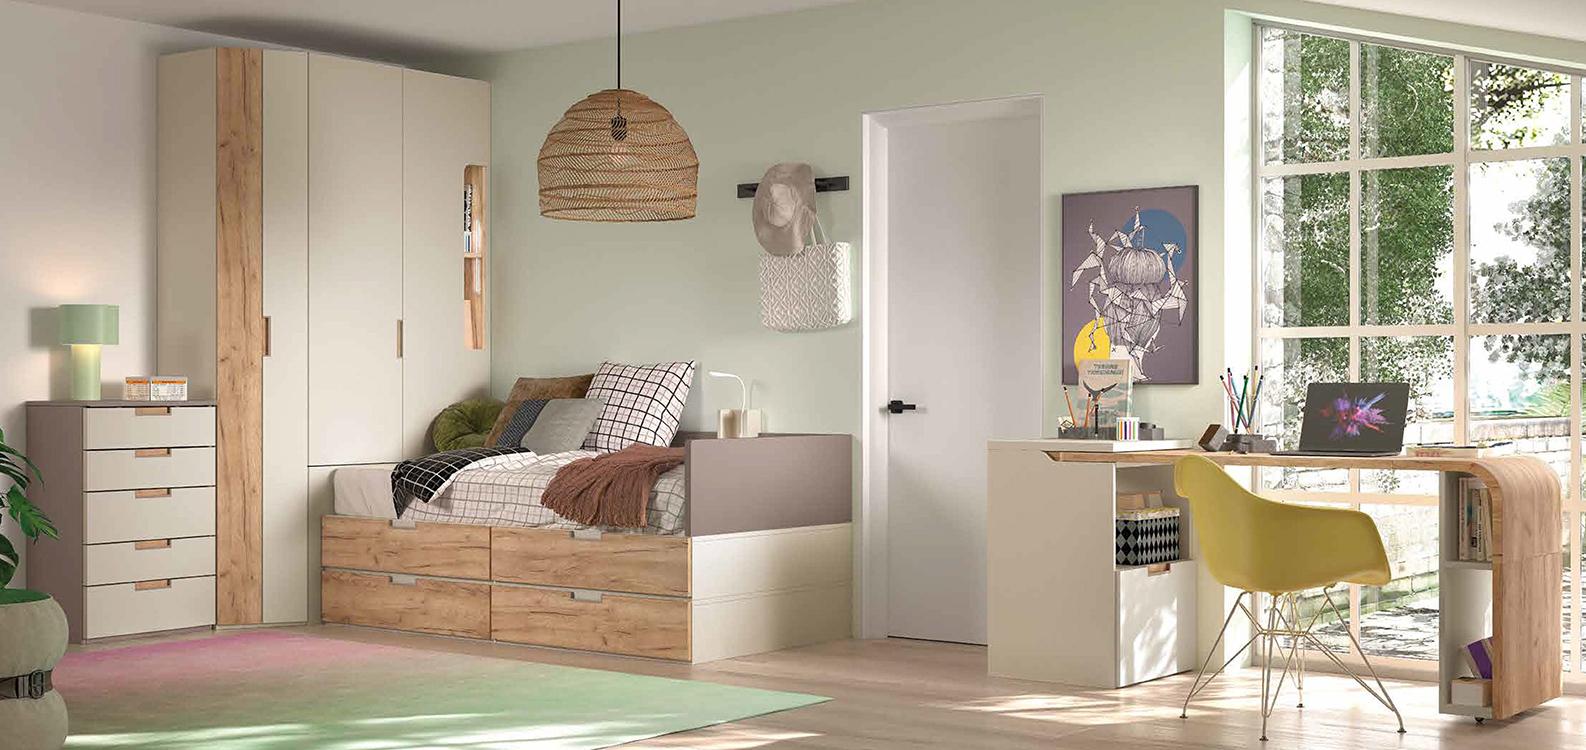 Roperos infantiles for Disenos de roperos para dormitorios